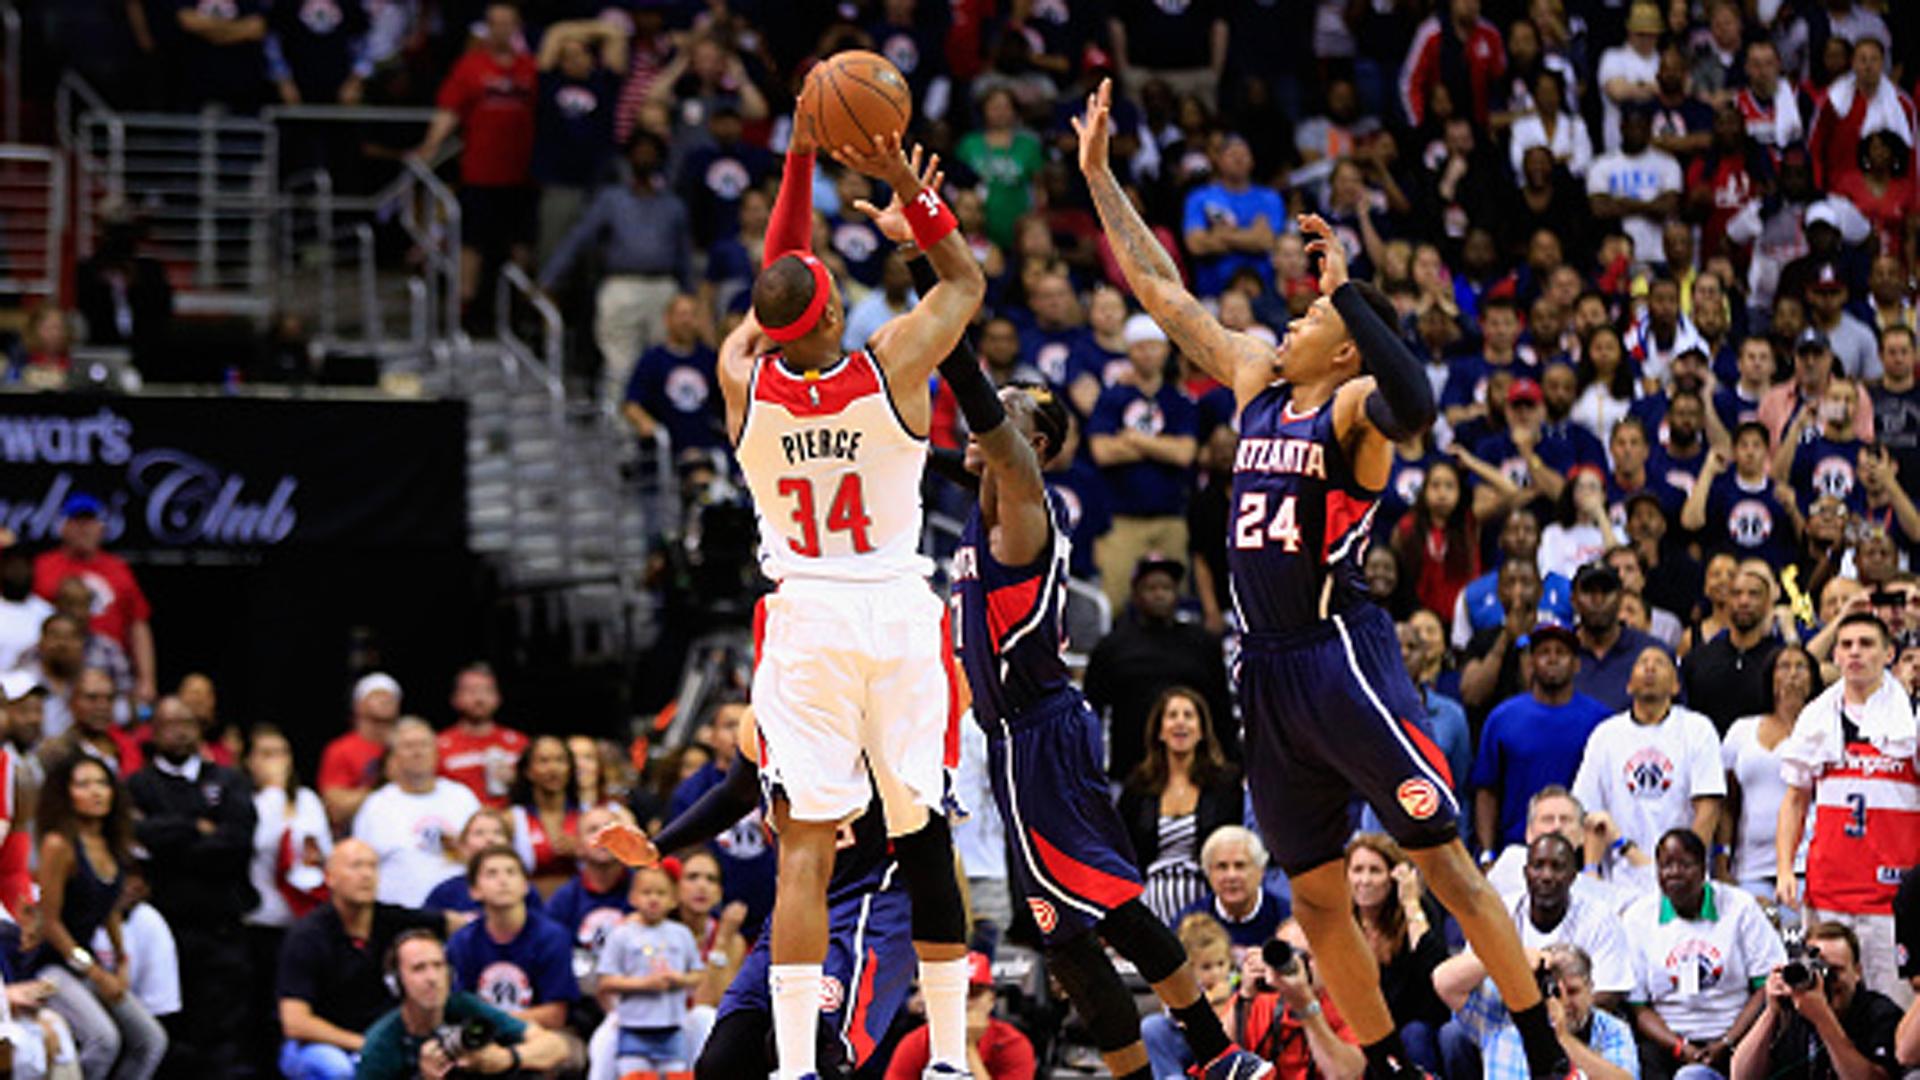 NBA: Hawks 101, Wizards 103 - Video - TSN